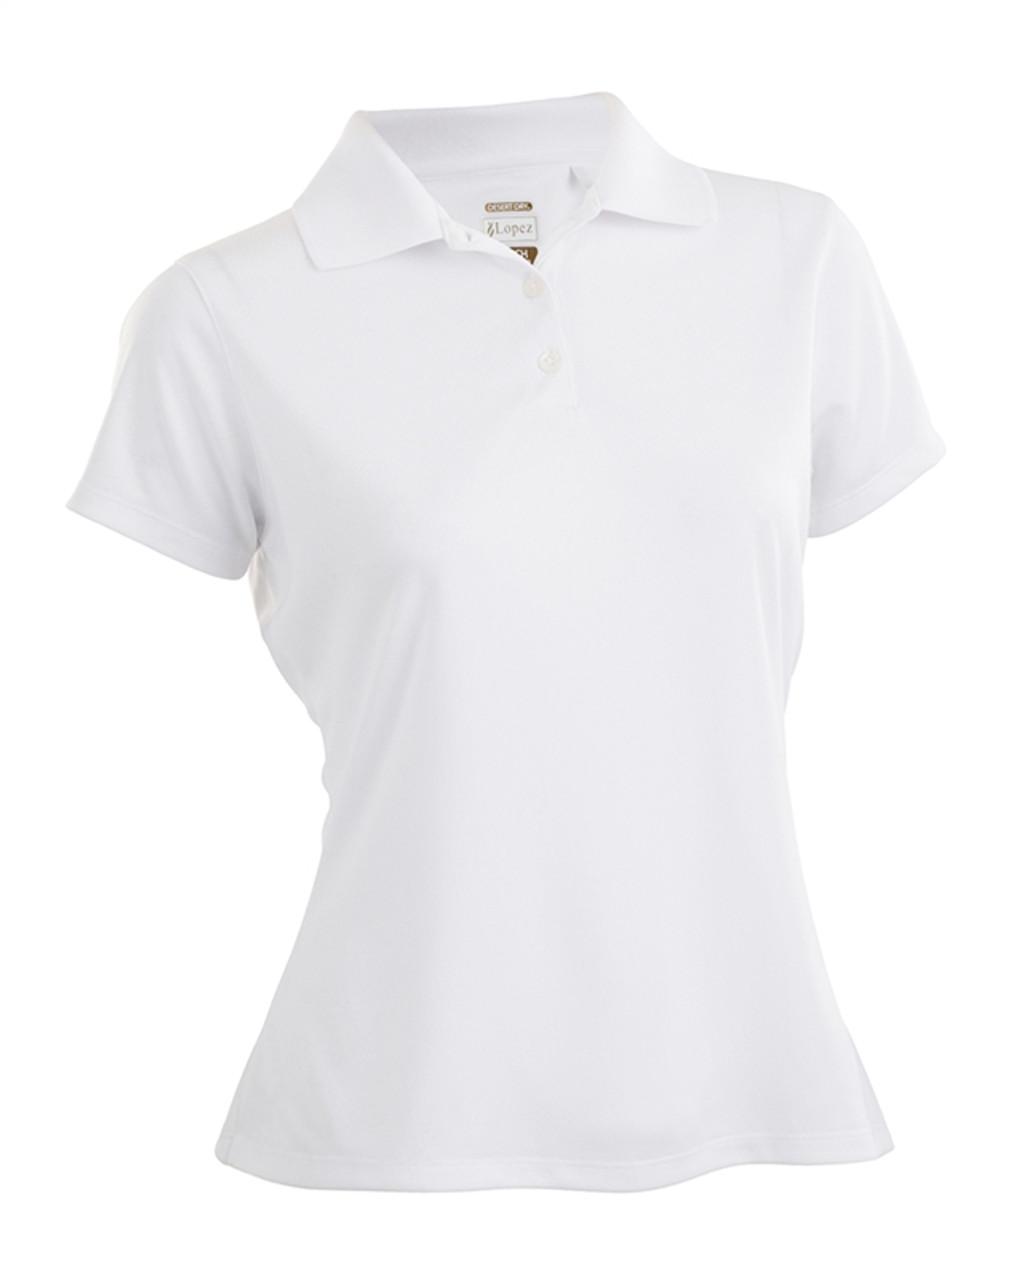 5faa4c2c41d Nancy Lopez Luster White Short Sleeve Polo